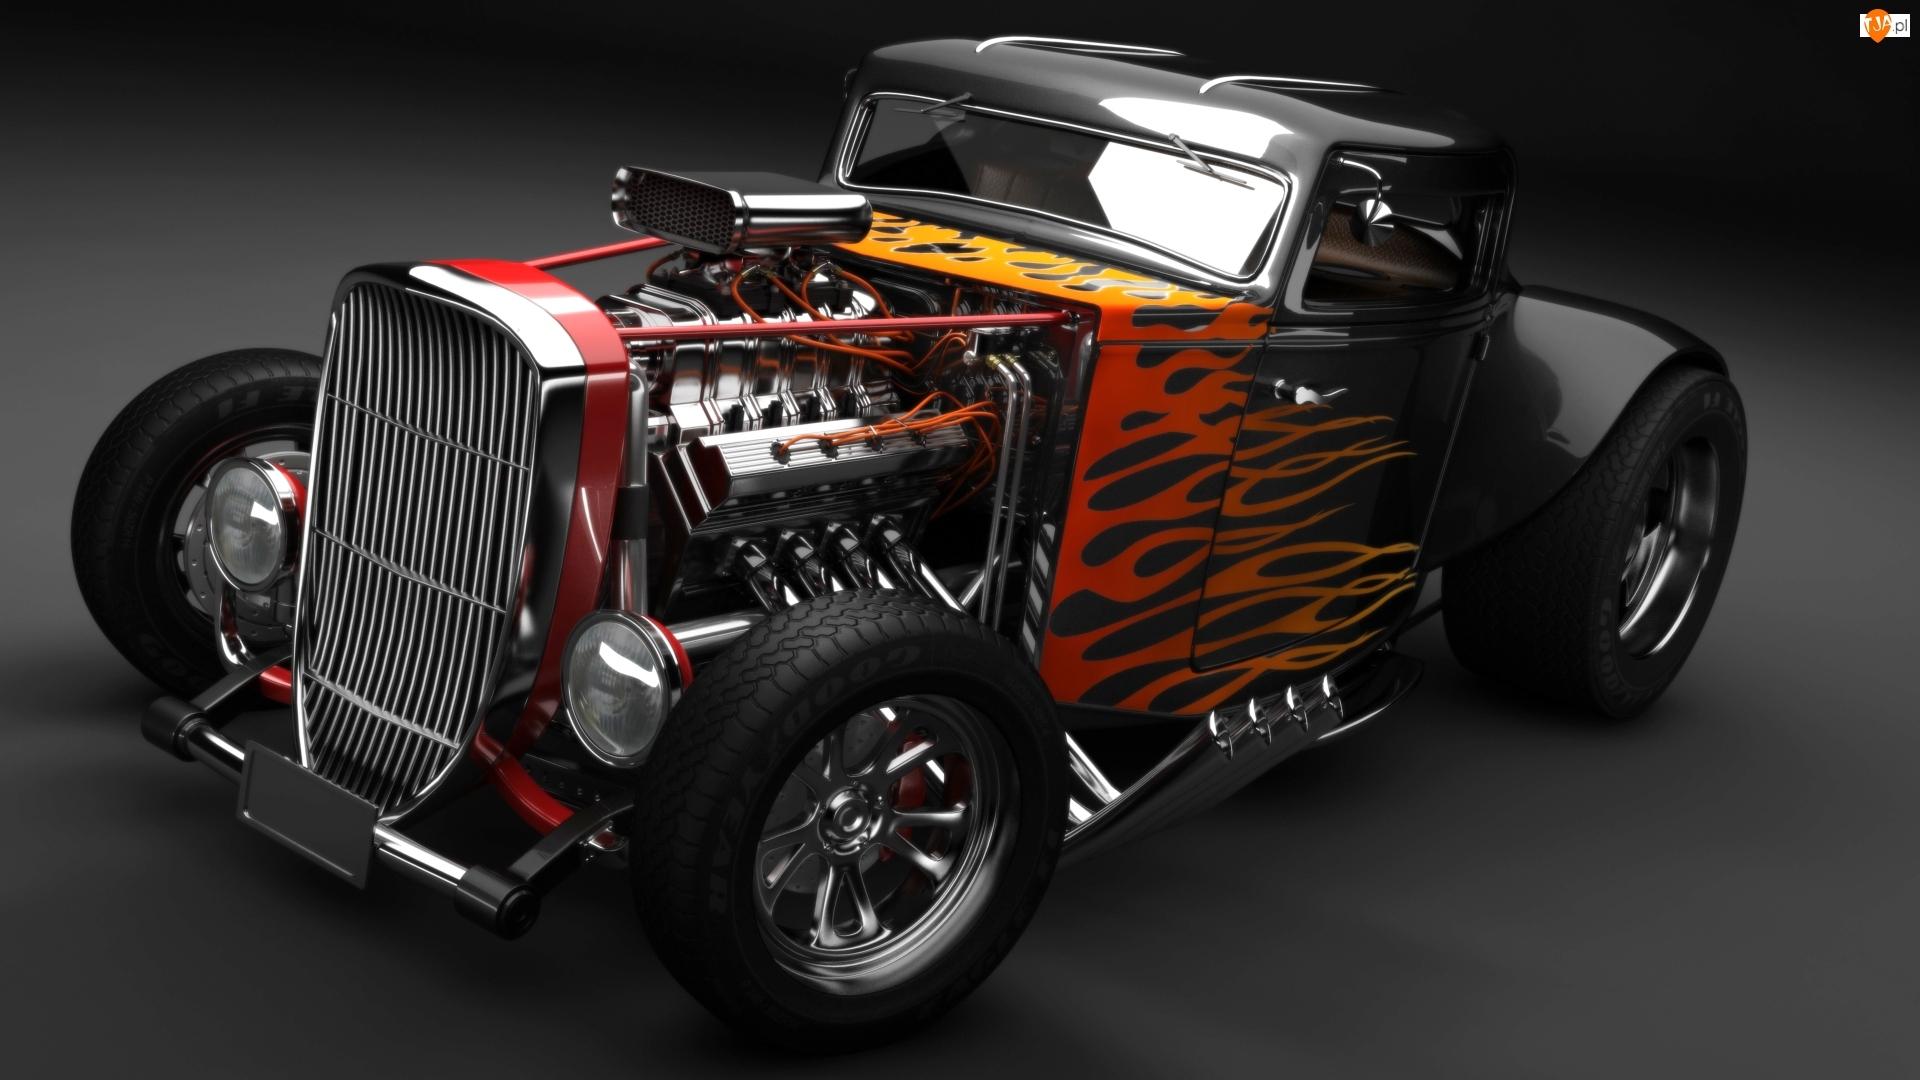 Hot Rod, Samochód, Ford